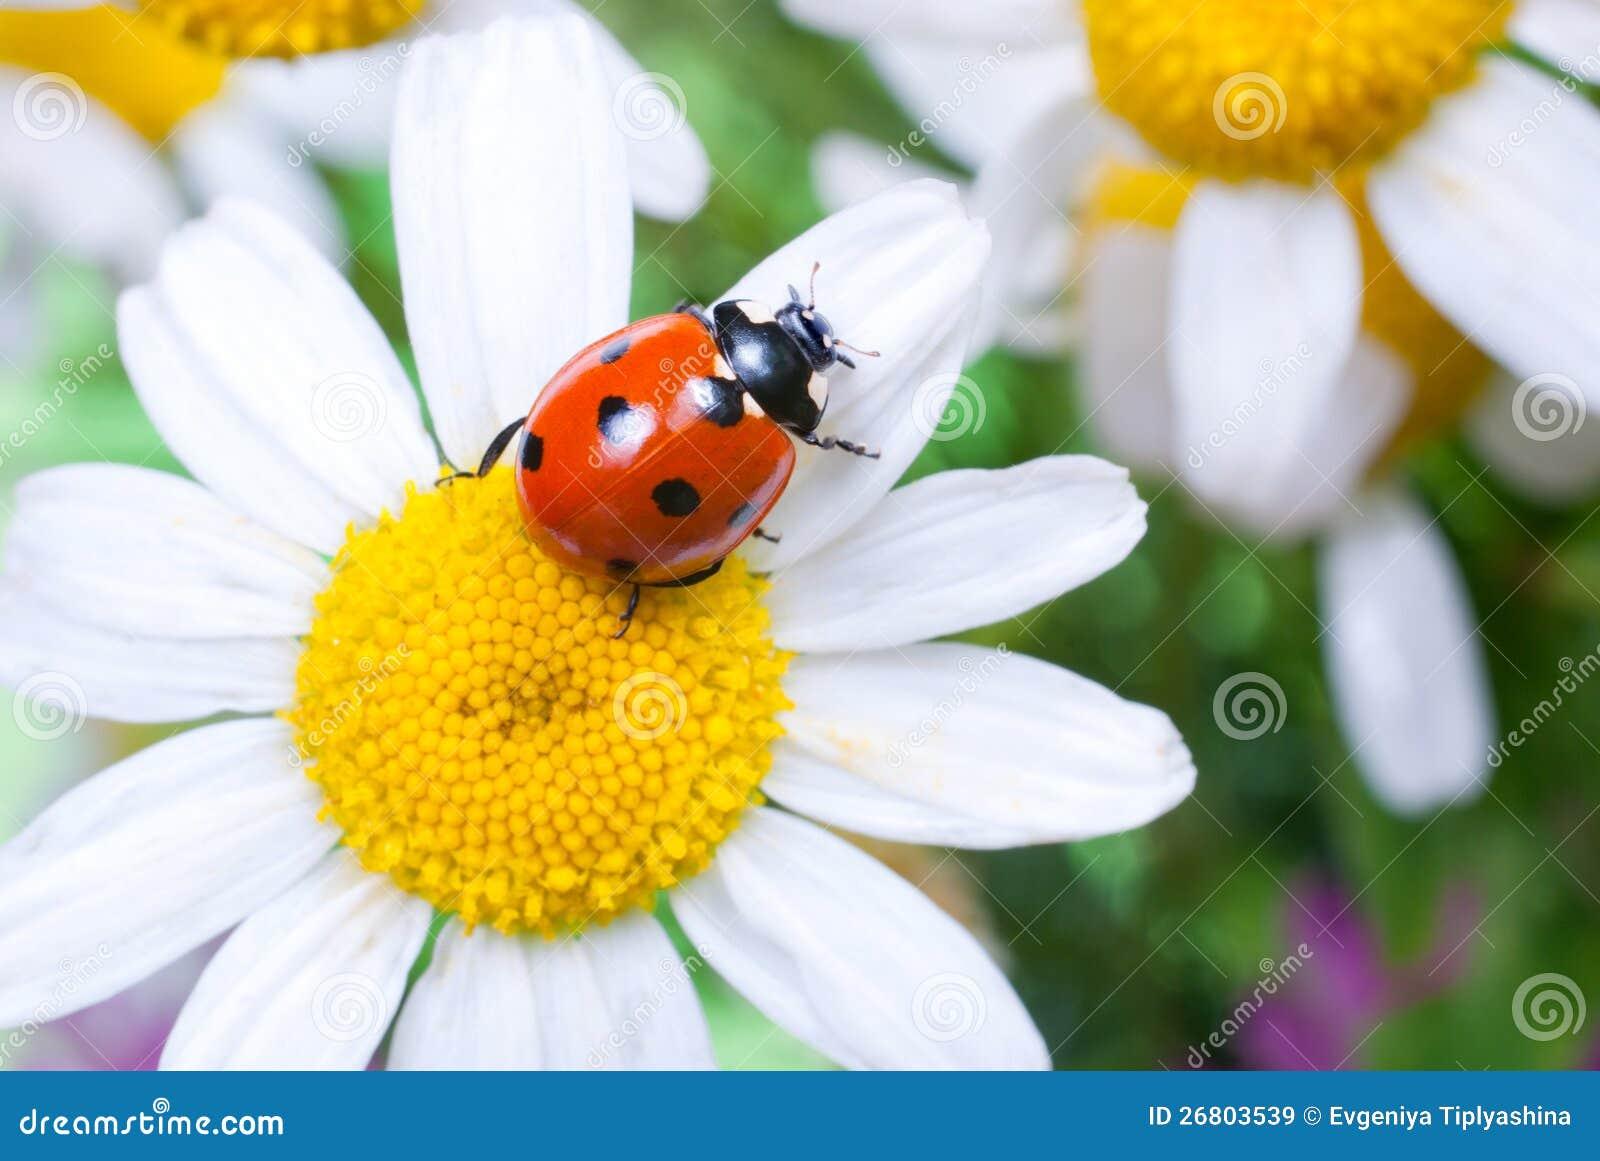 https://thumbs.dreamstime.com/z/ladybug-flower-26803539.jpg